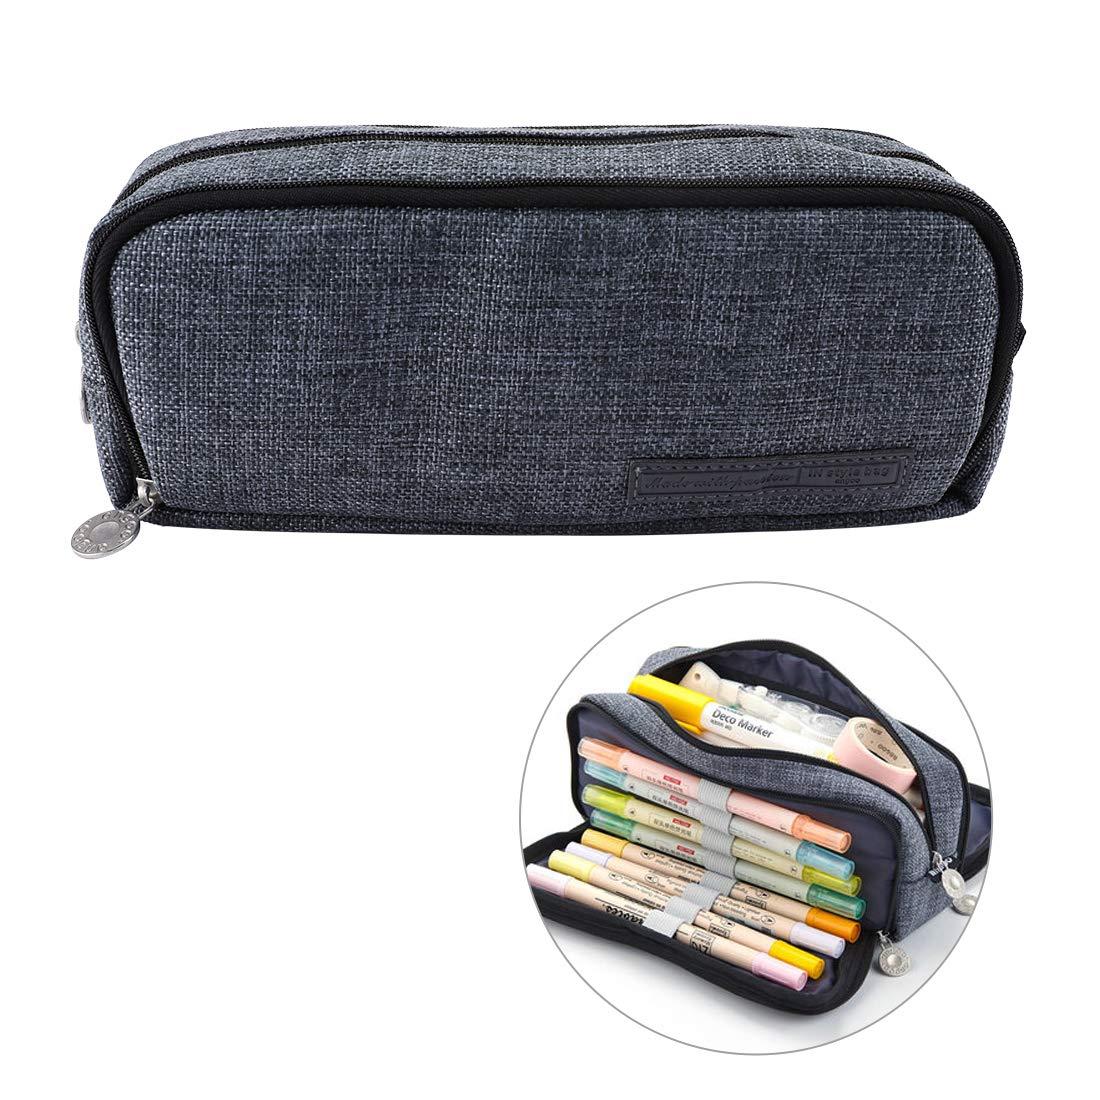 Oyachic Triple Zipper Pen Case Multi Compartments Pencil Case 3 Zippers Pen Bag Pouch Holder Square Grid Cosmetic Bags Organizer Stationery Box (Dark Gray)